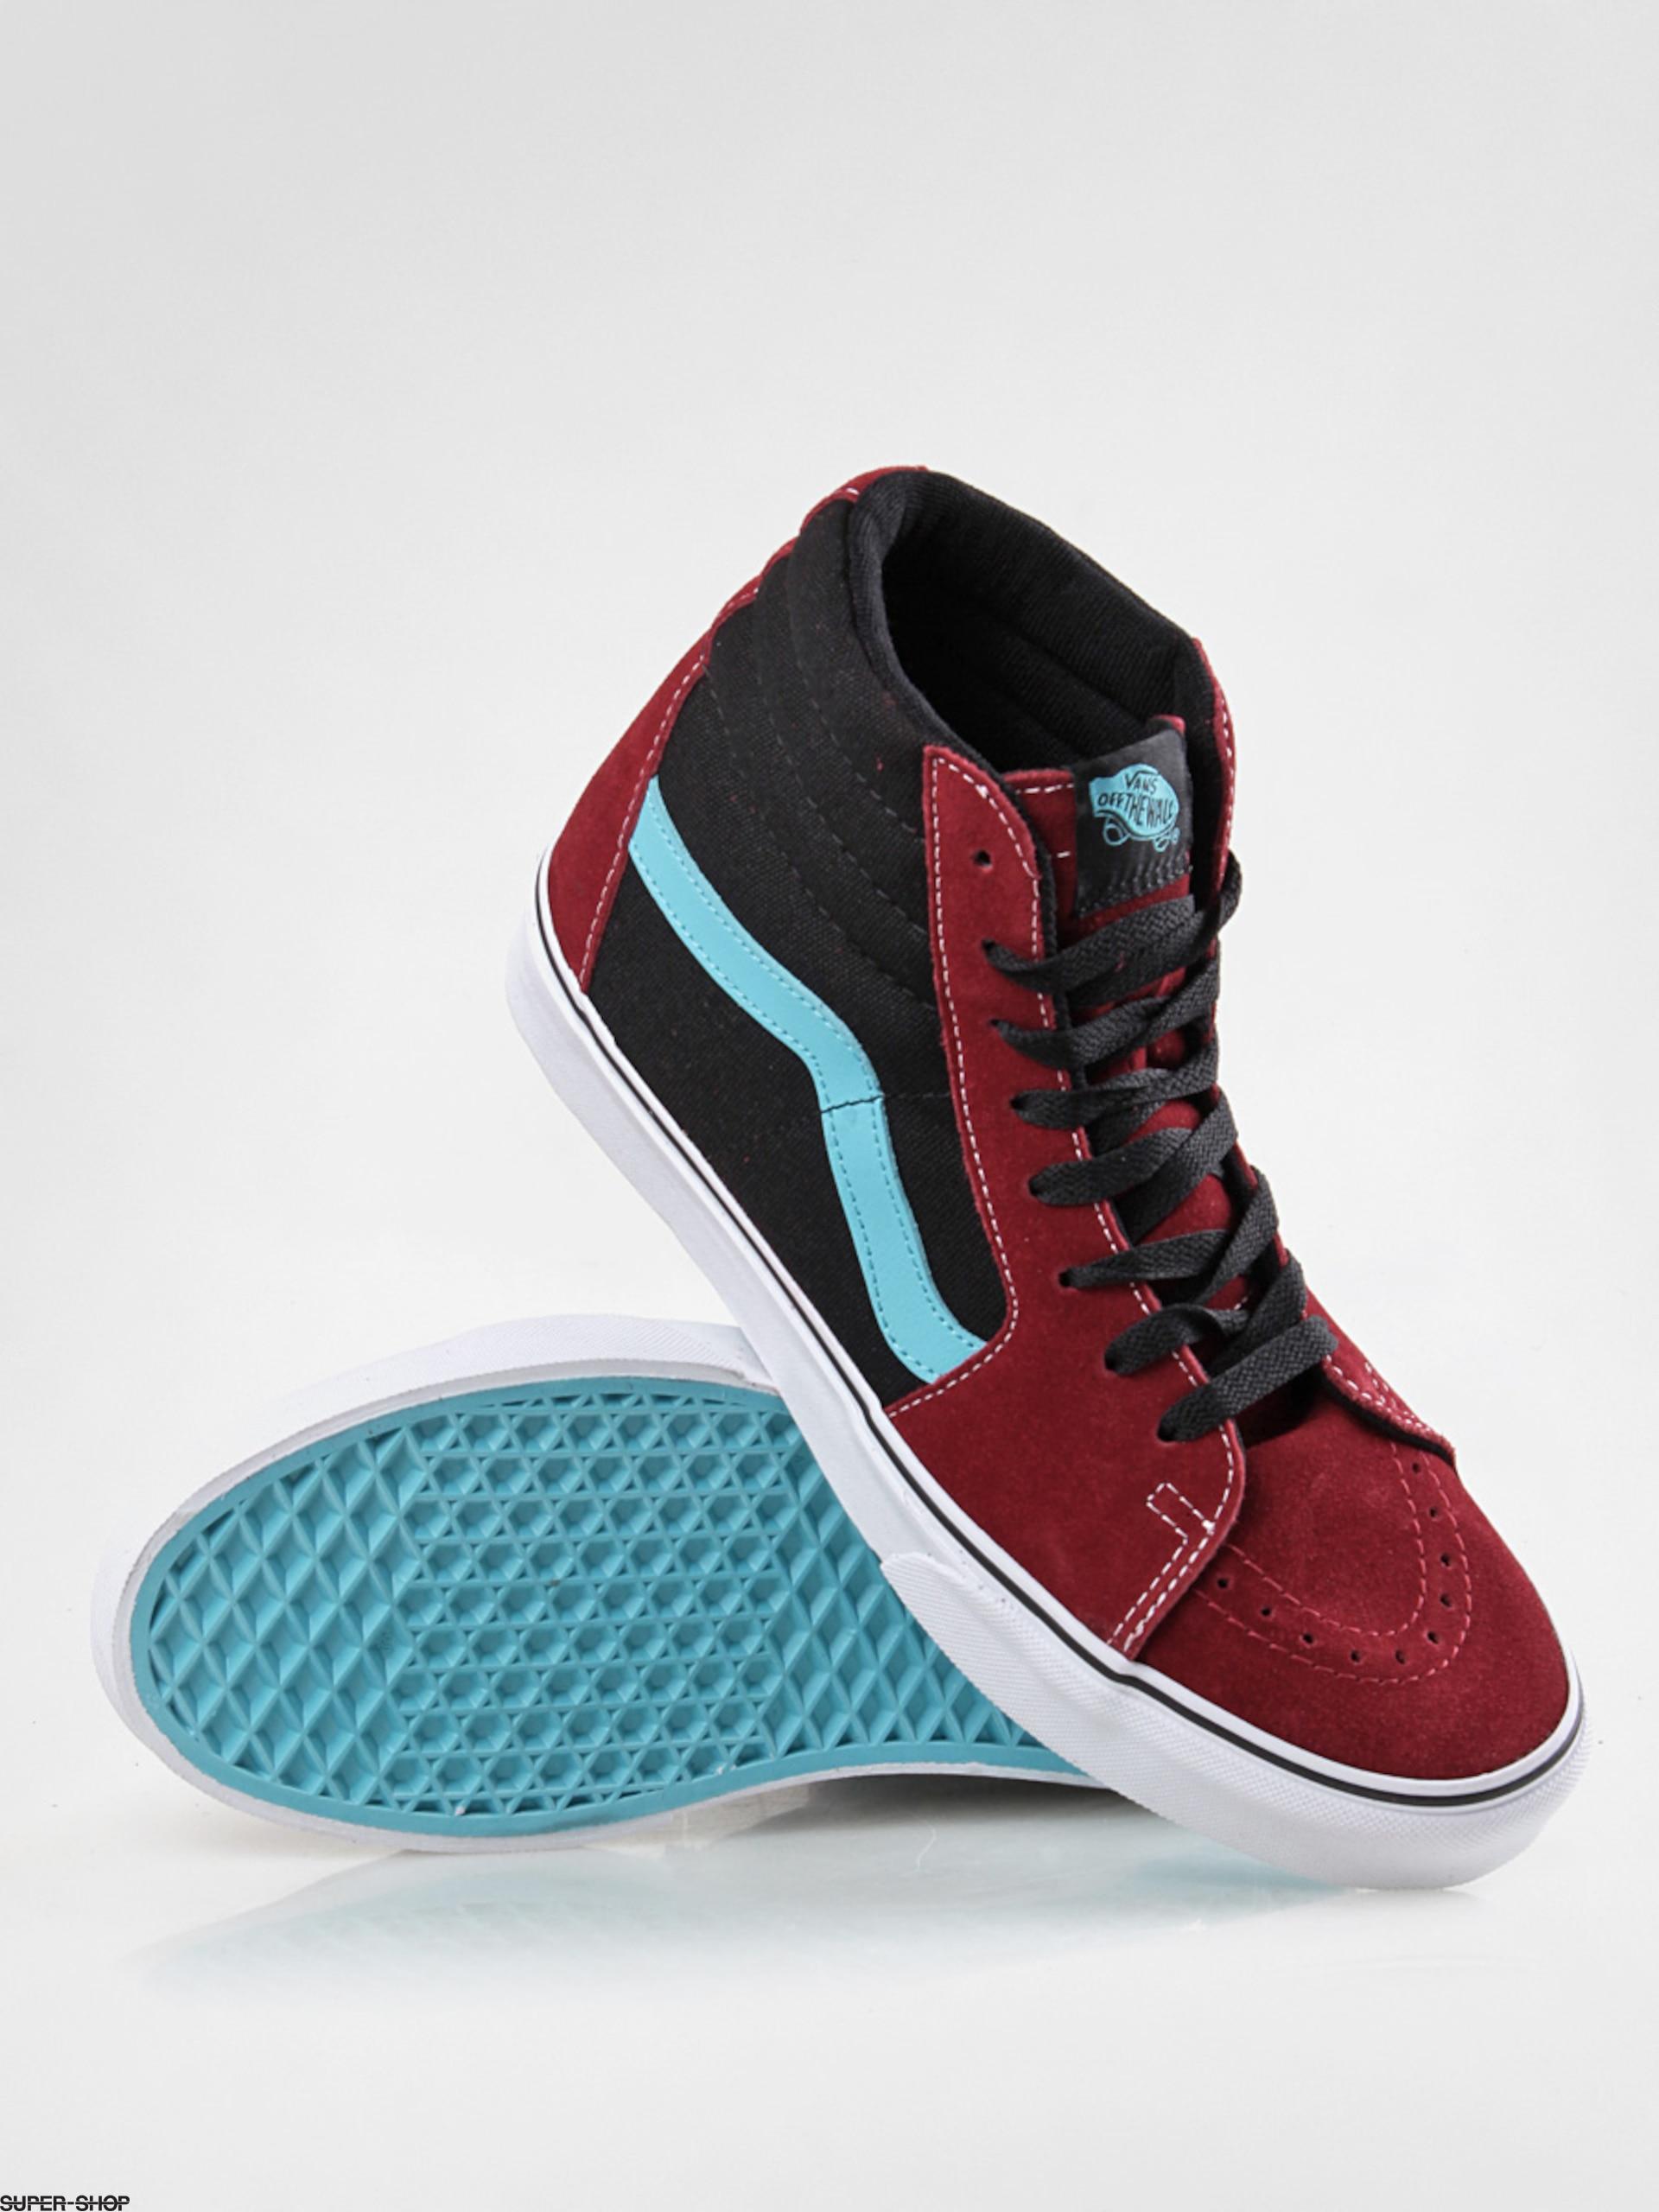 5c09a7526abd 521064-w1920-vans-shoes-sk8hi-suede-scuba-chili-pepper.jpg